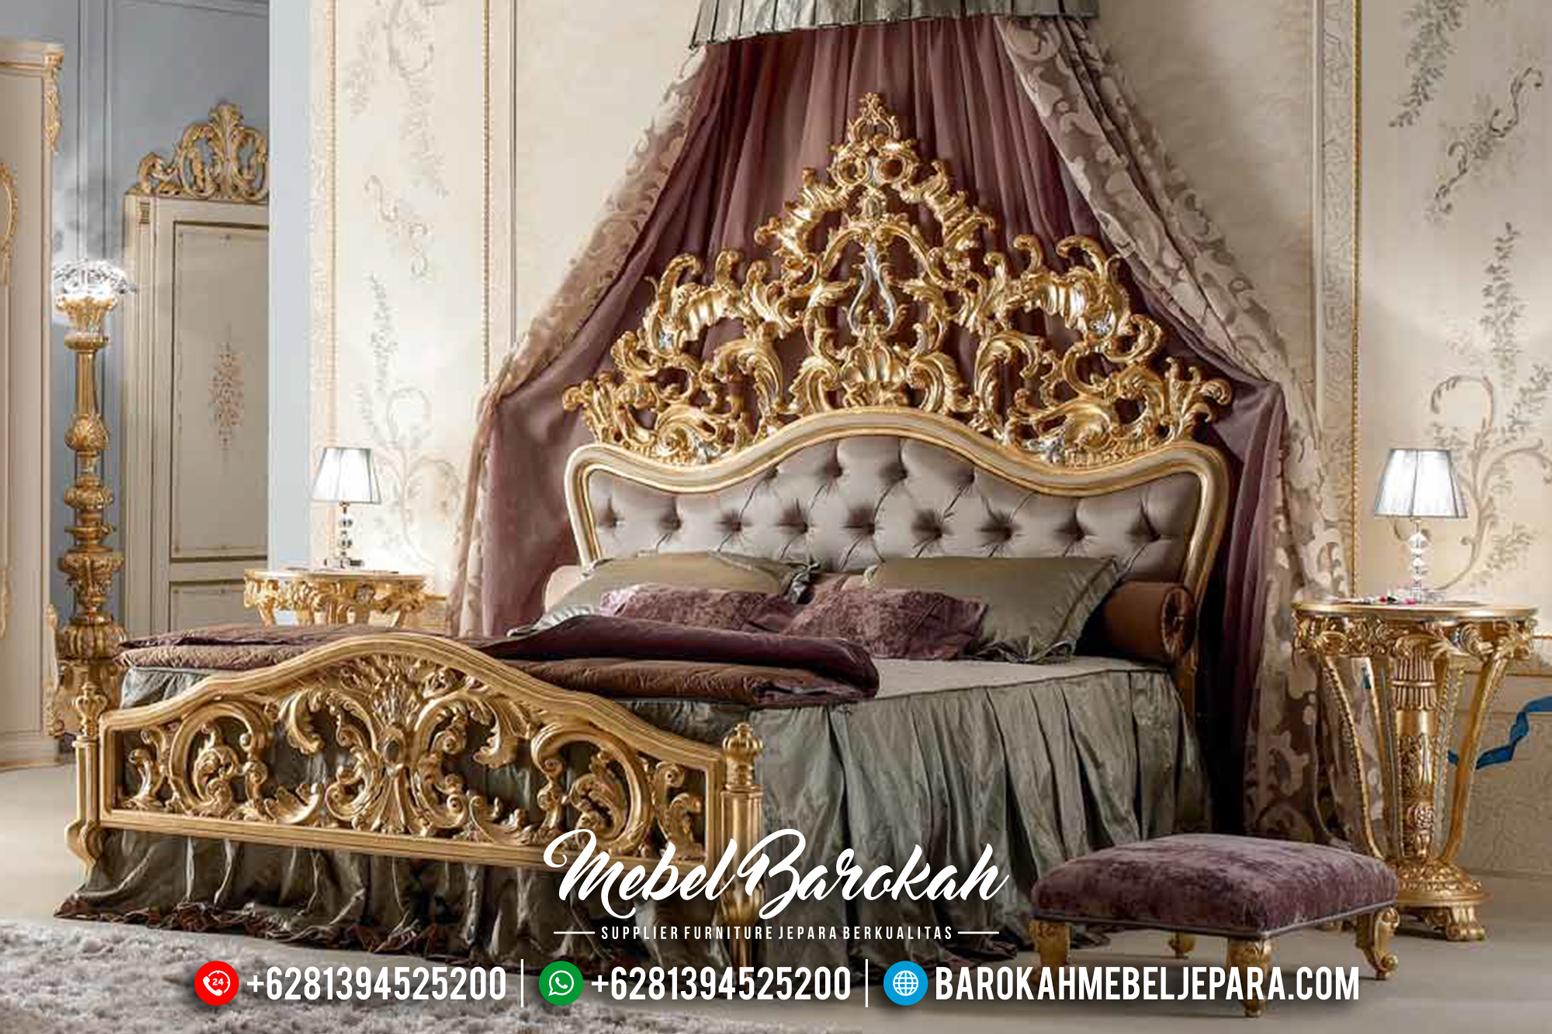 Luxurious Indonesian Furnitures Tempat Tidur Mewah Jepara Gold Leaf MB-0180